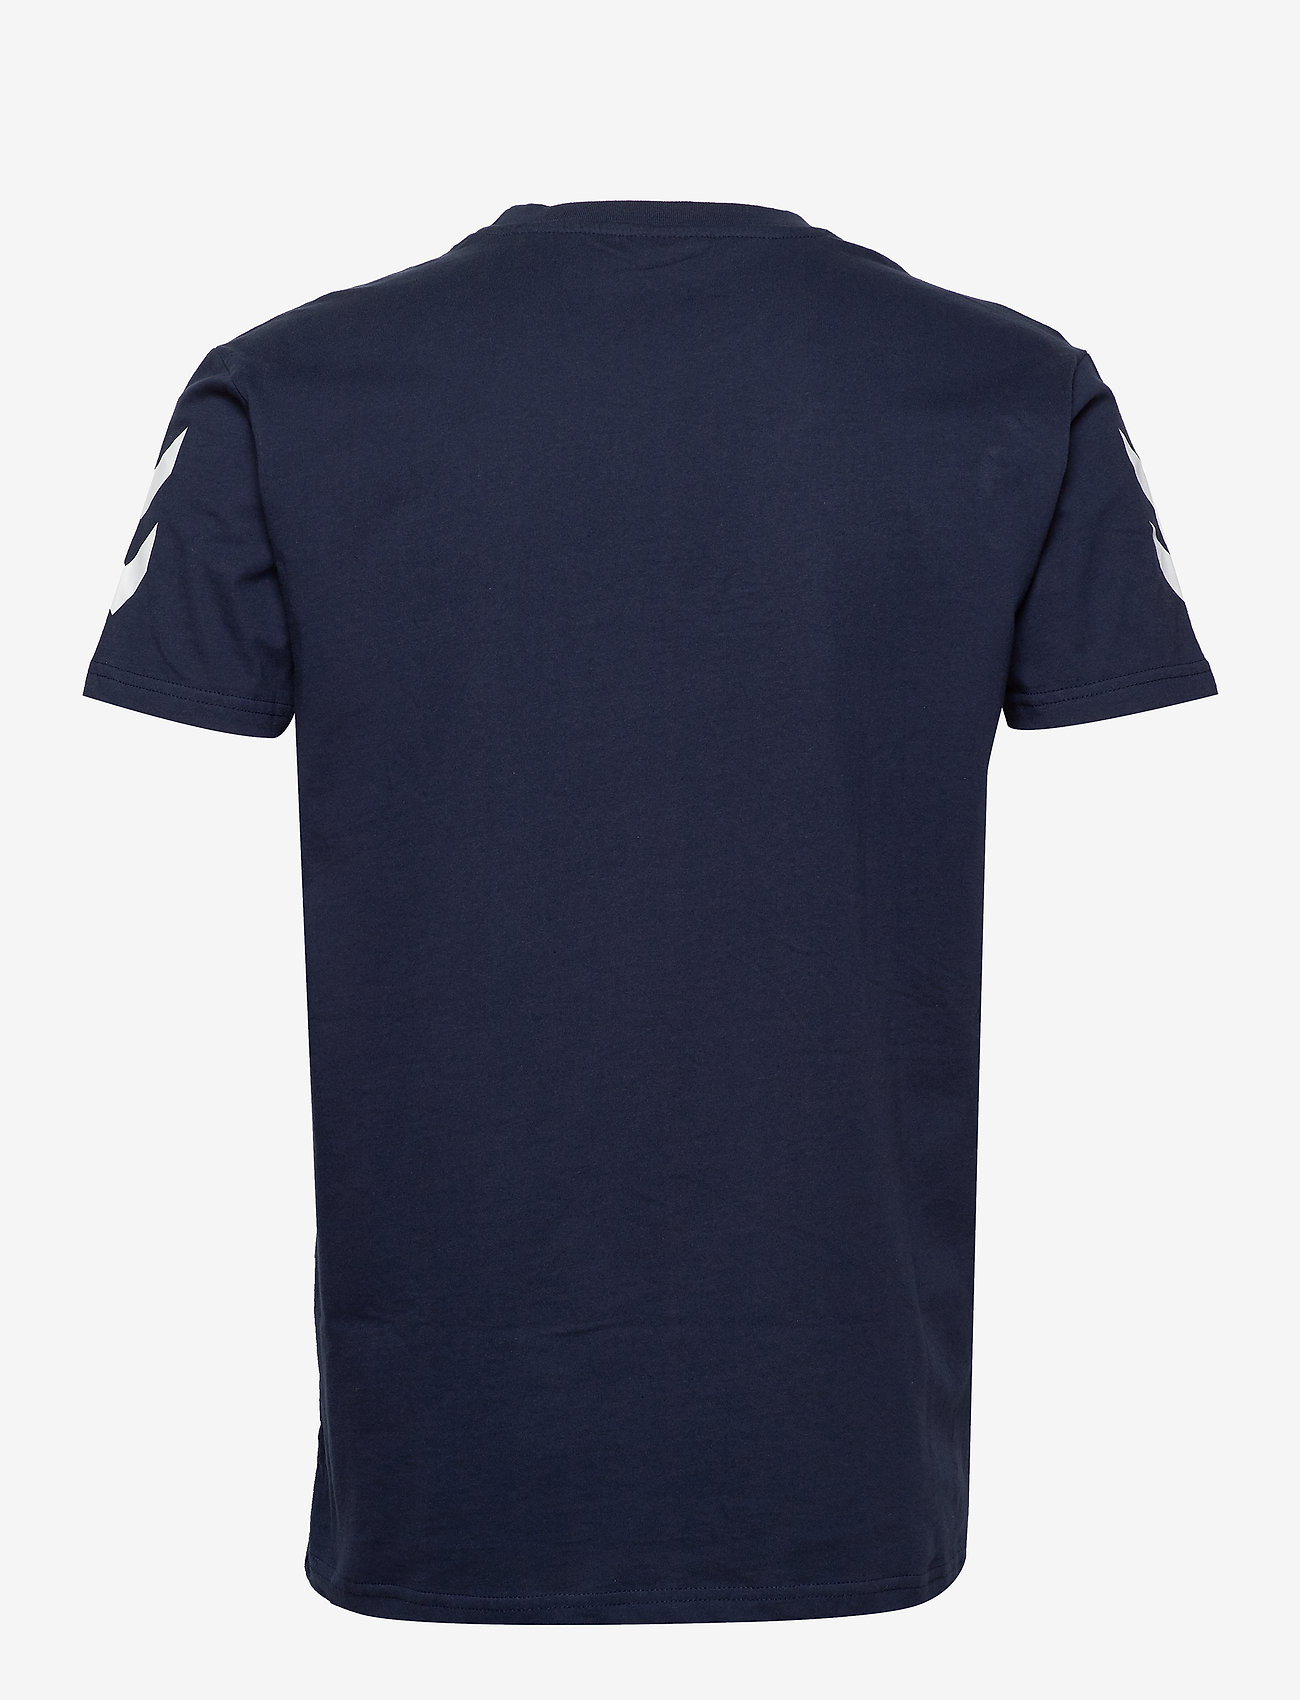 Hummel - HMLGO COTTON T-SHIRT S/S - t-shirts - marine - 1